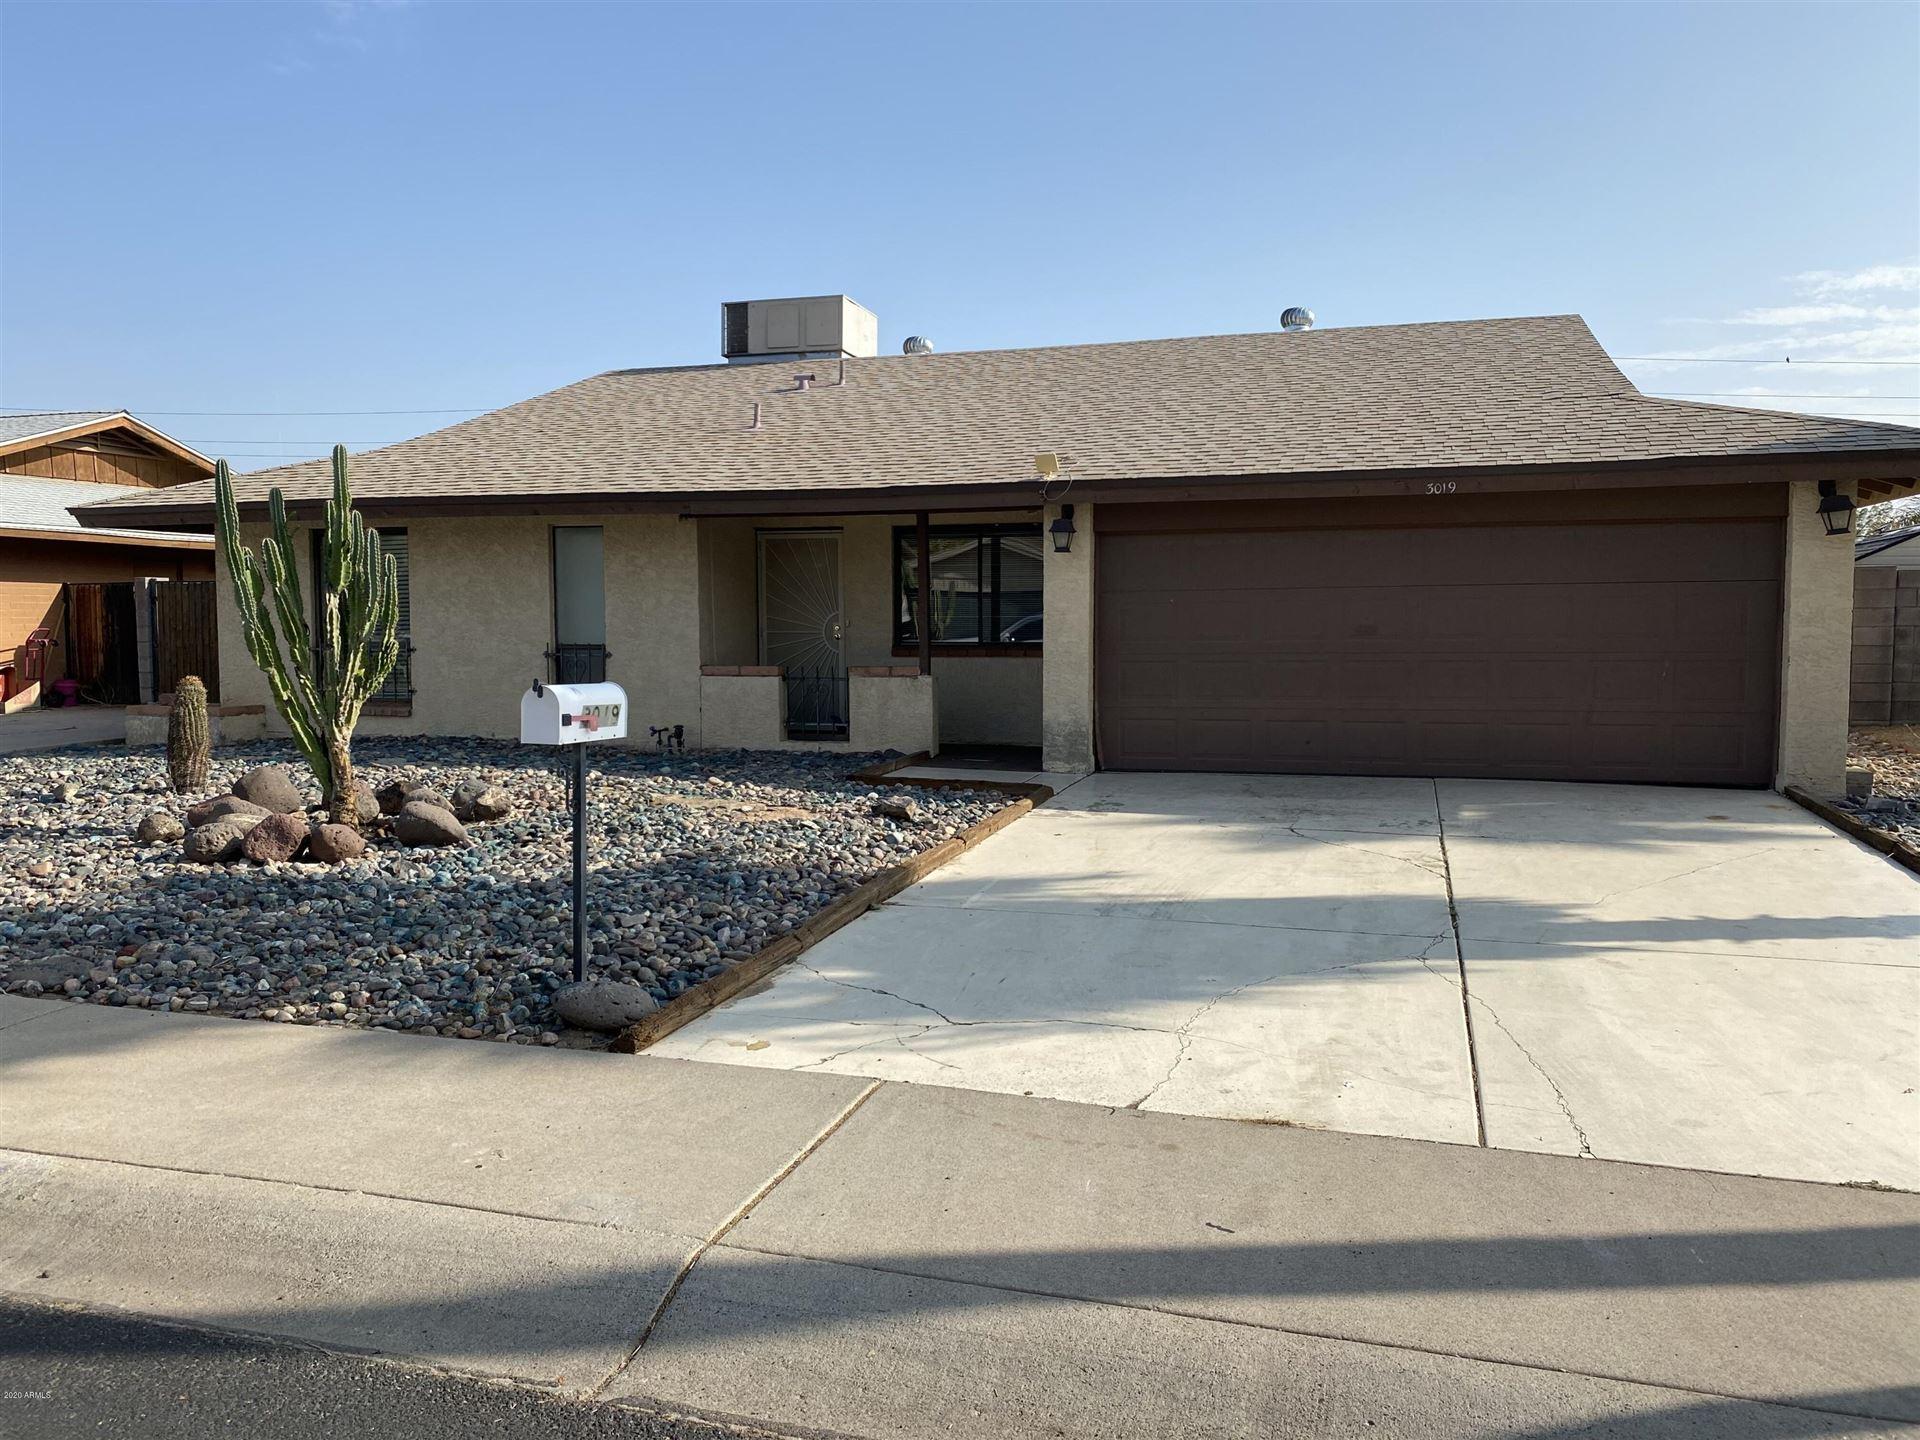 3019 W LIBBY Street, Phoenix, AZ 85053 - MLS#: 6132096